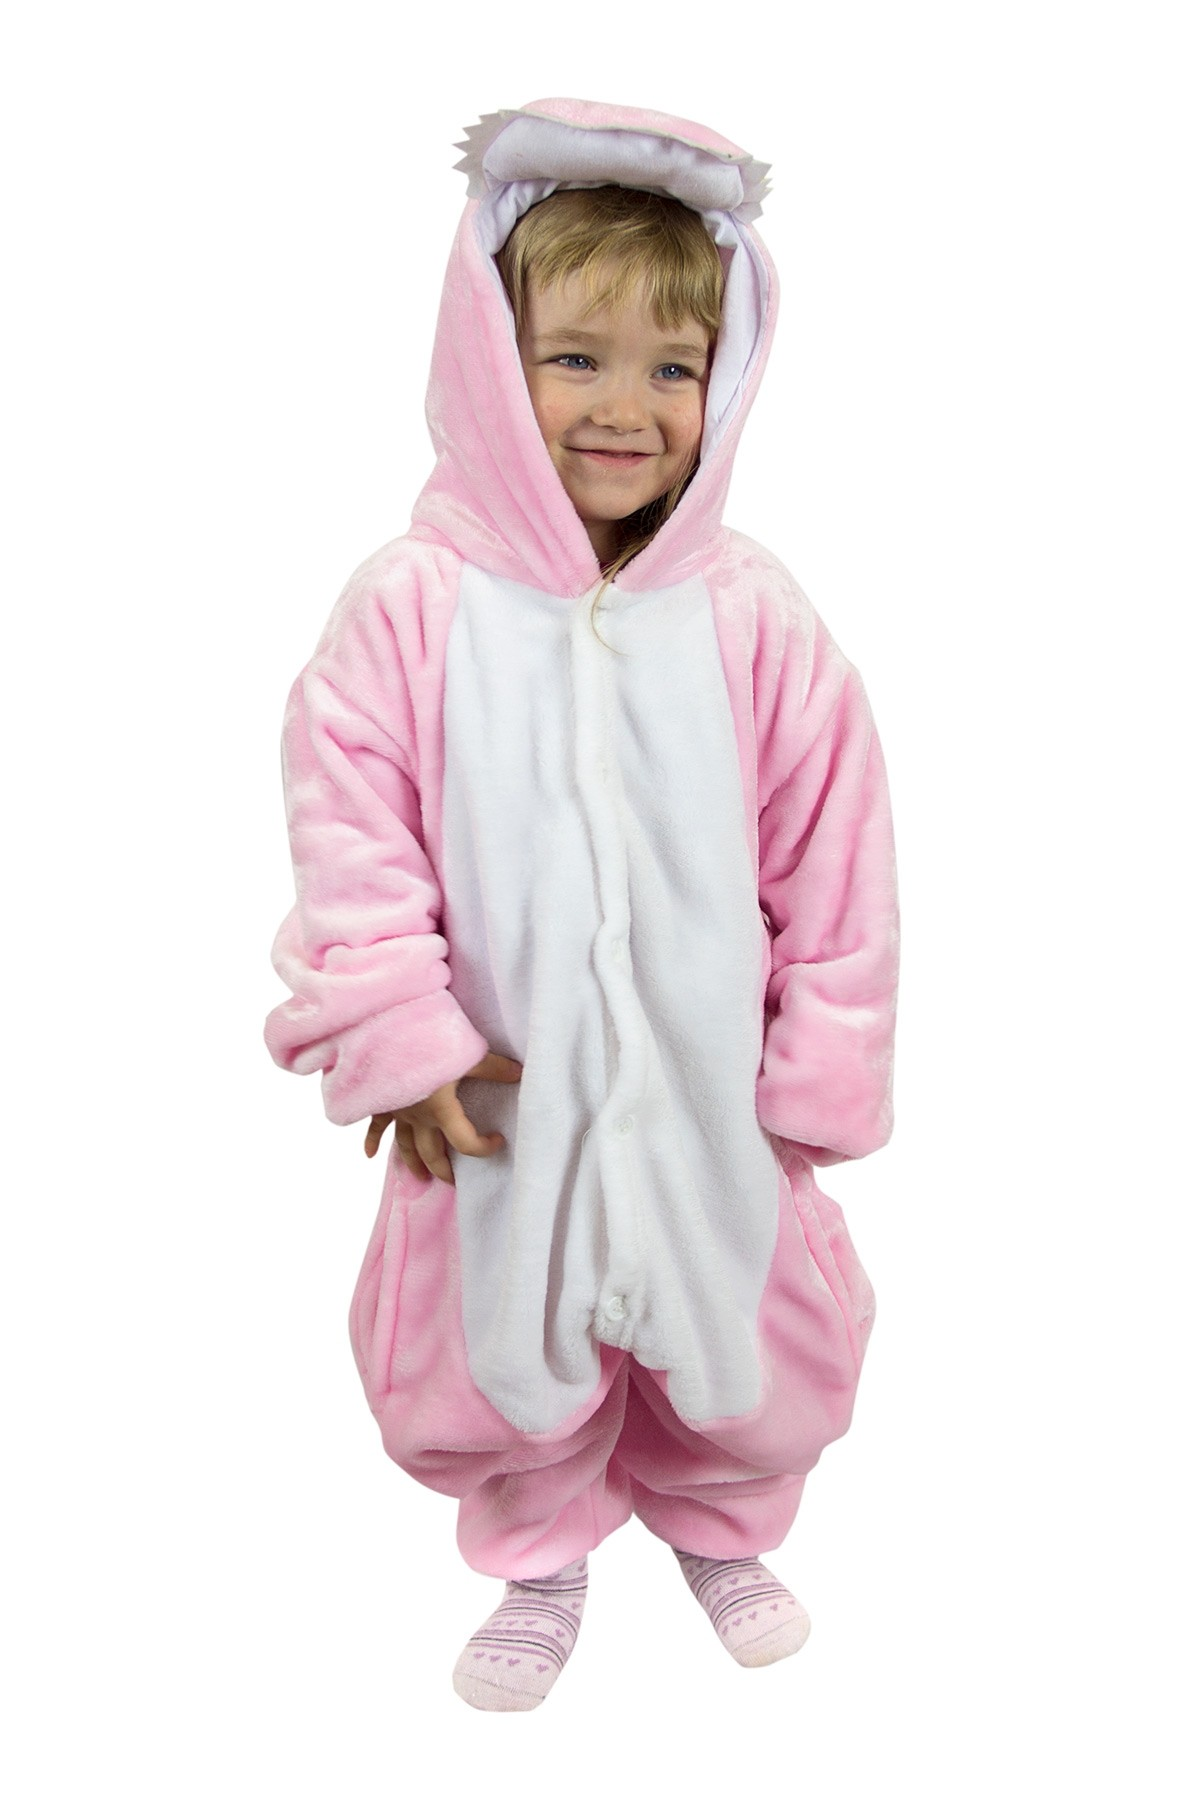 Детская пижама-кигуруми Дракоша (26) оцинкованный фартук на парапет